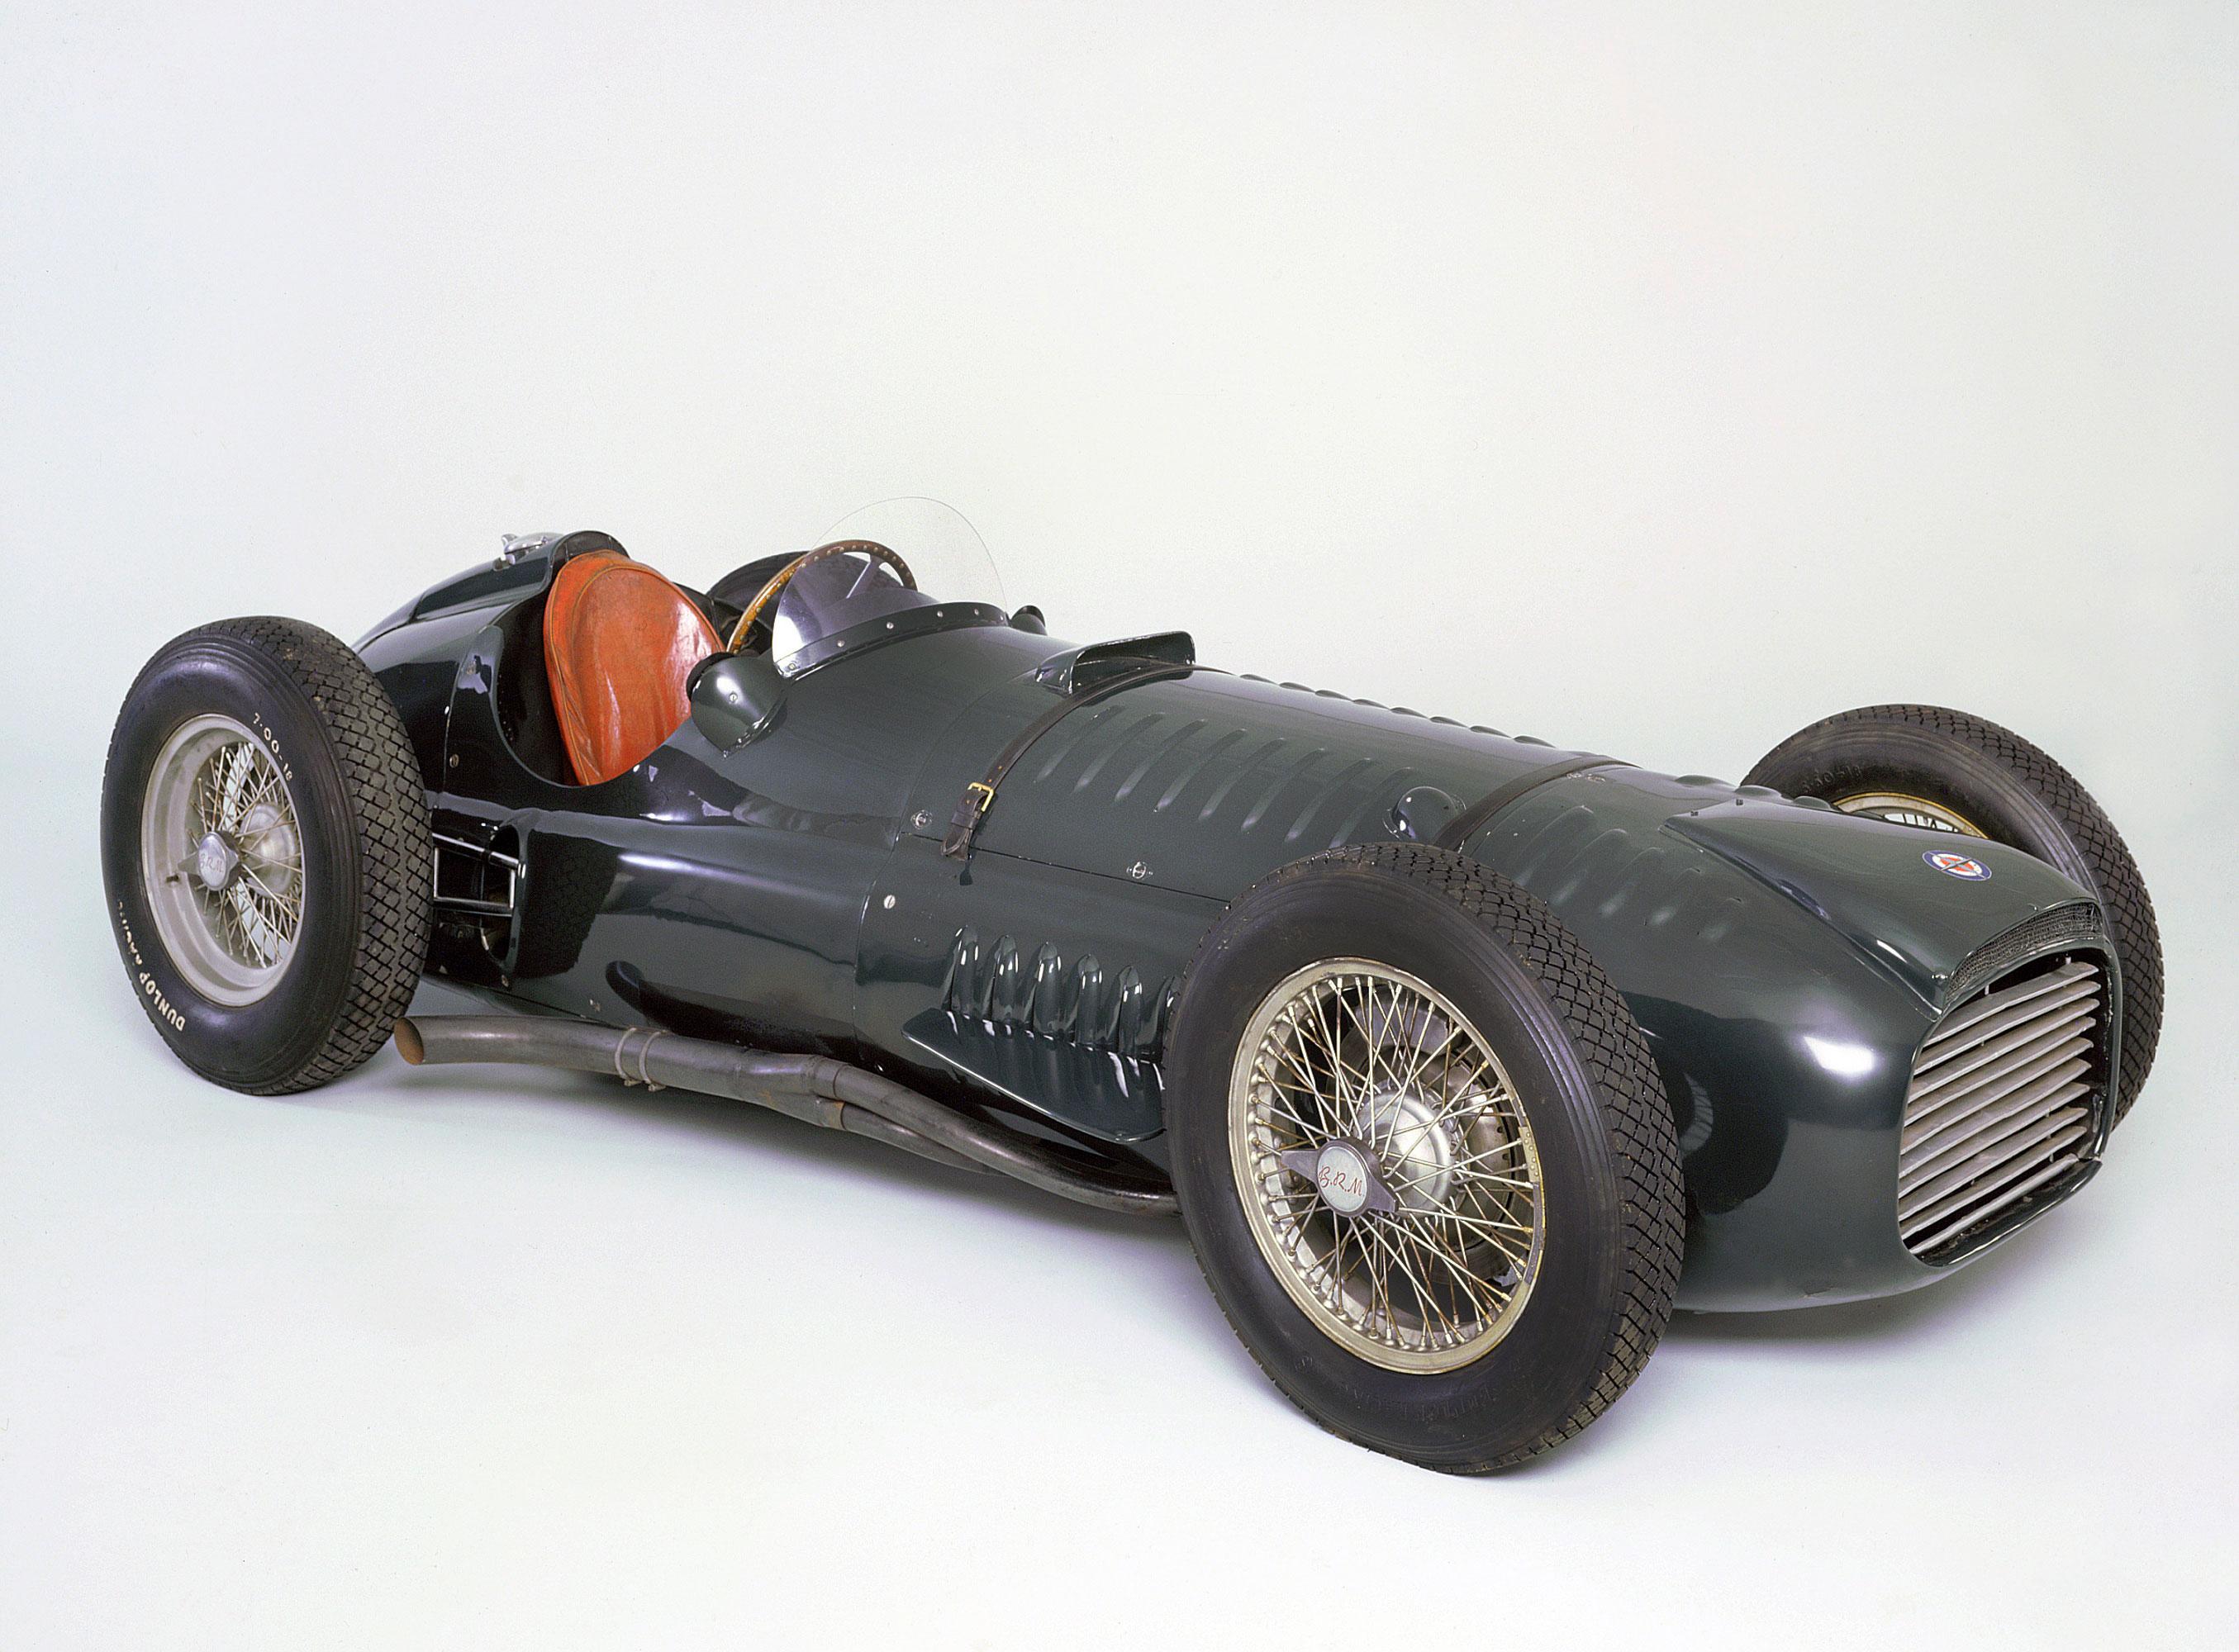 1950 BRM 1.5 litre V16 Type 15 MkI Grand Prix car